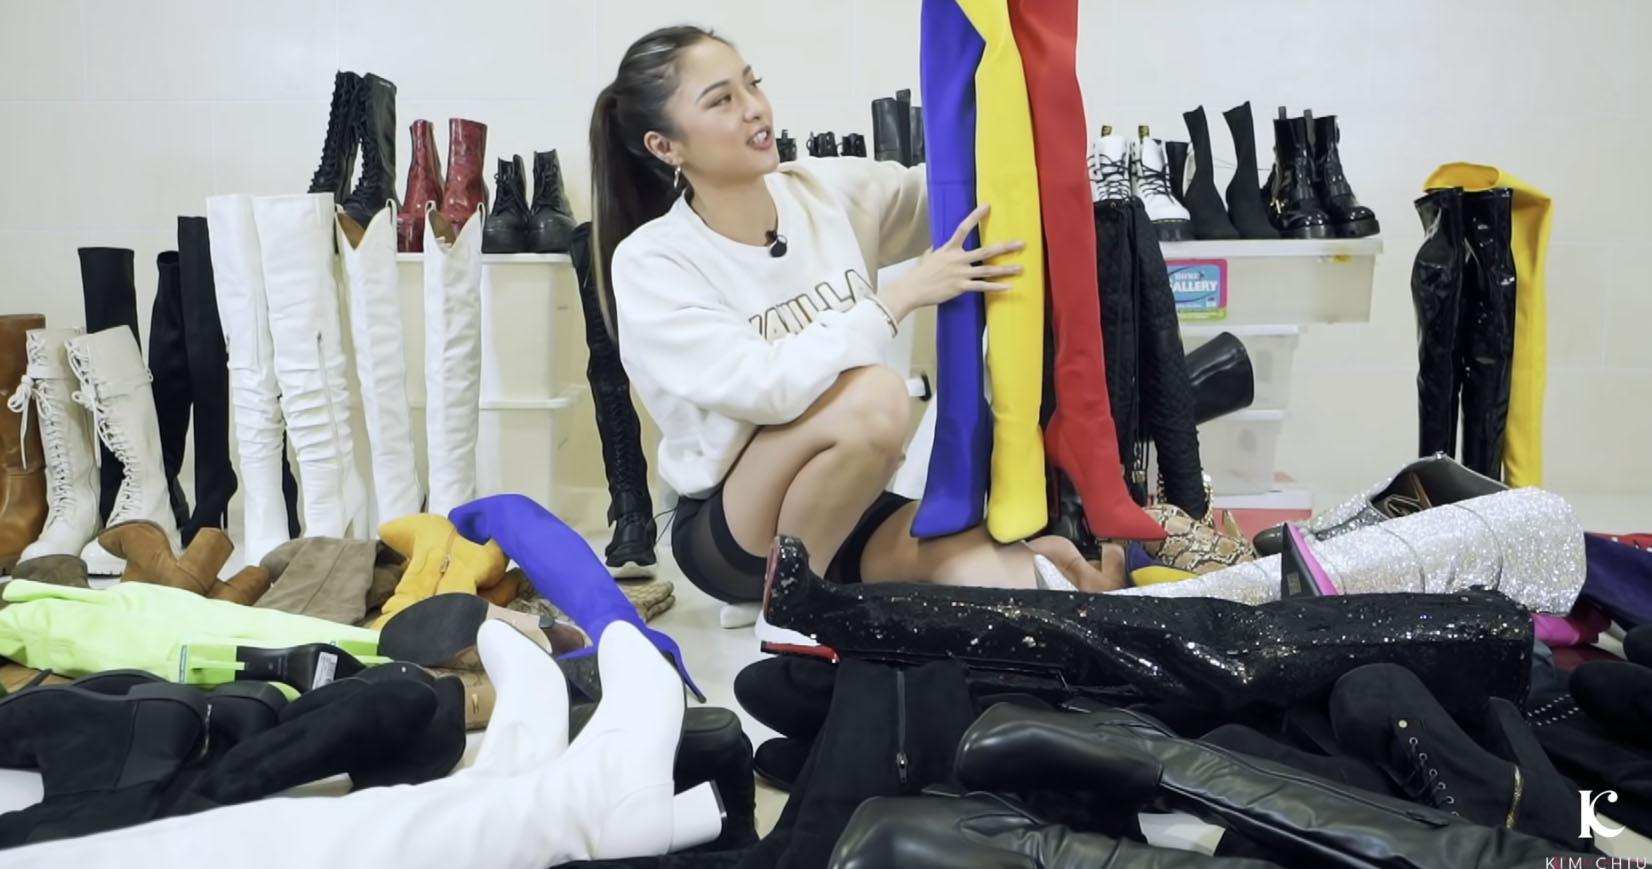 Youtube Vlog Screengrab: Kim Chiu Naked Wolfe boots